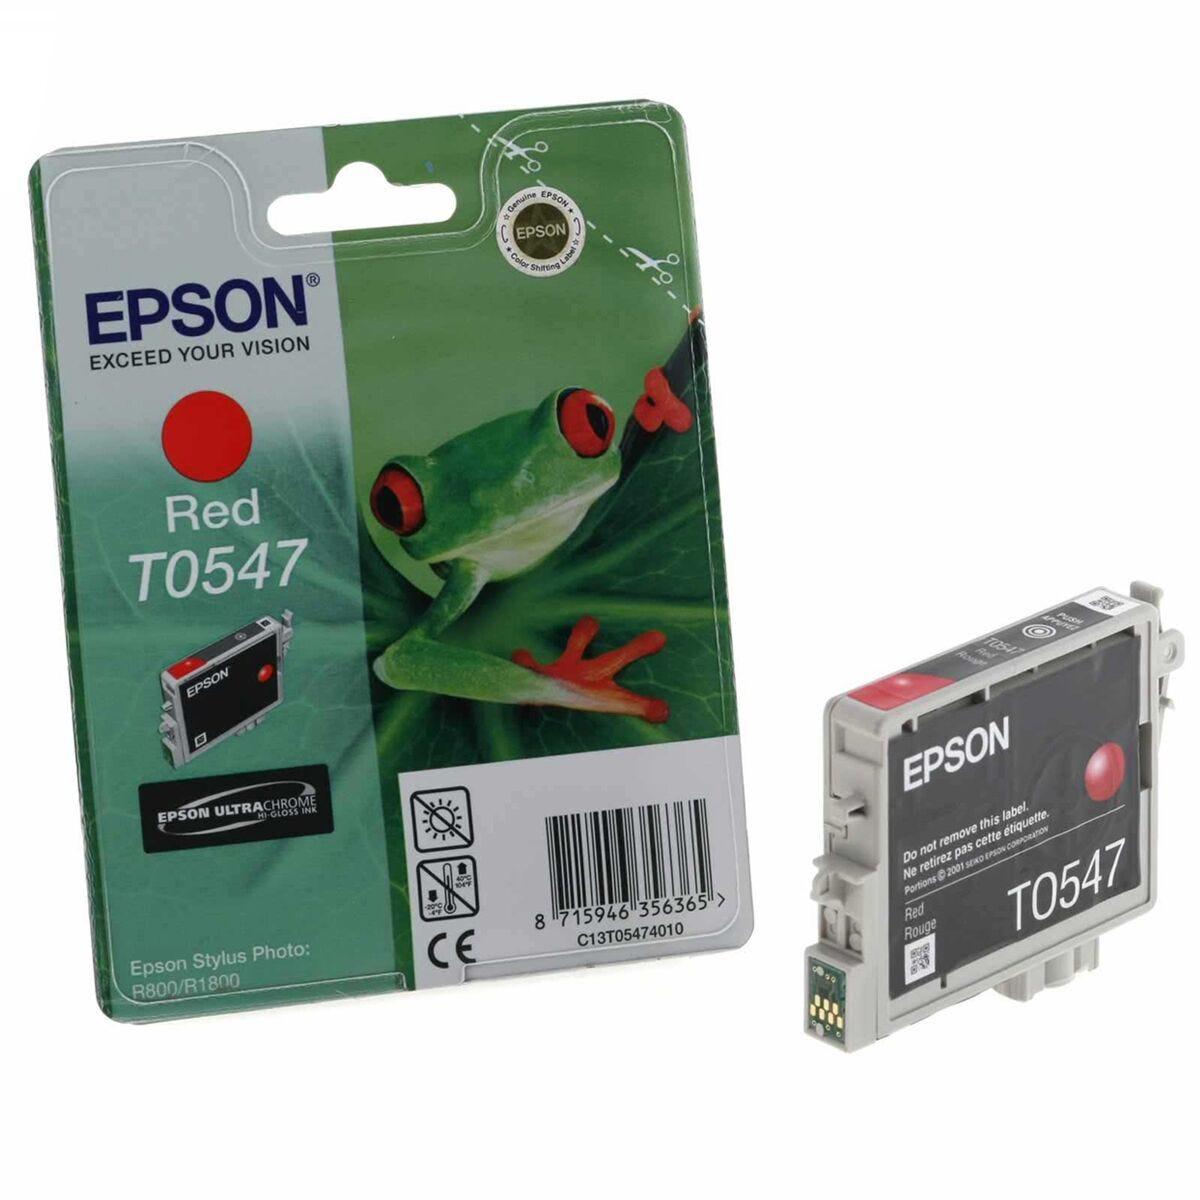 Epson T0547 Ink Cartridge 13ml